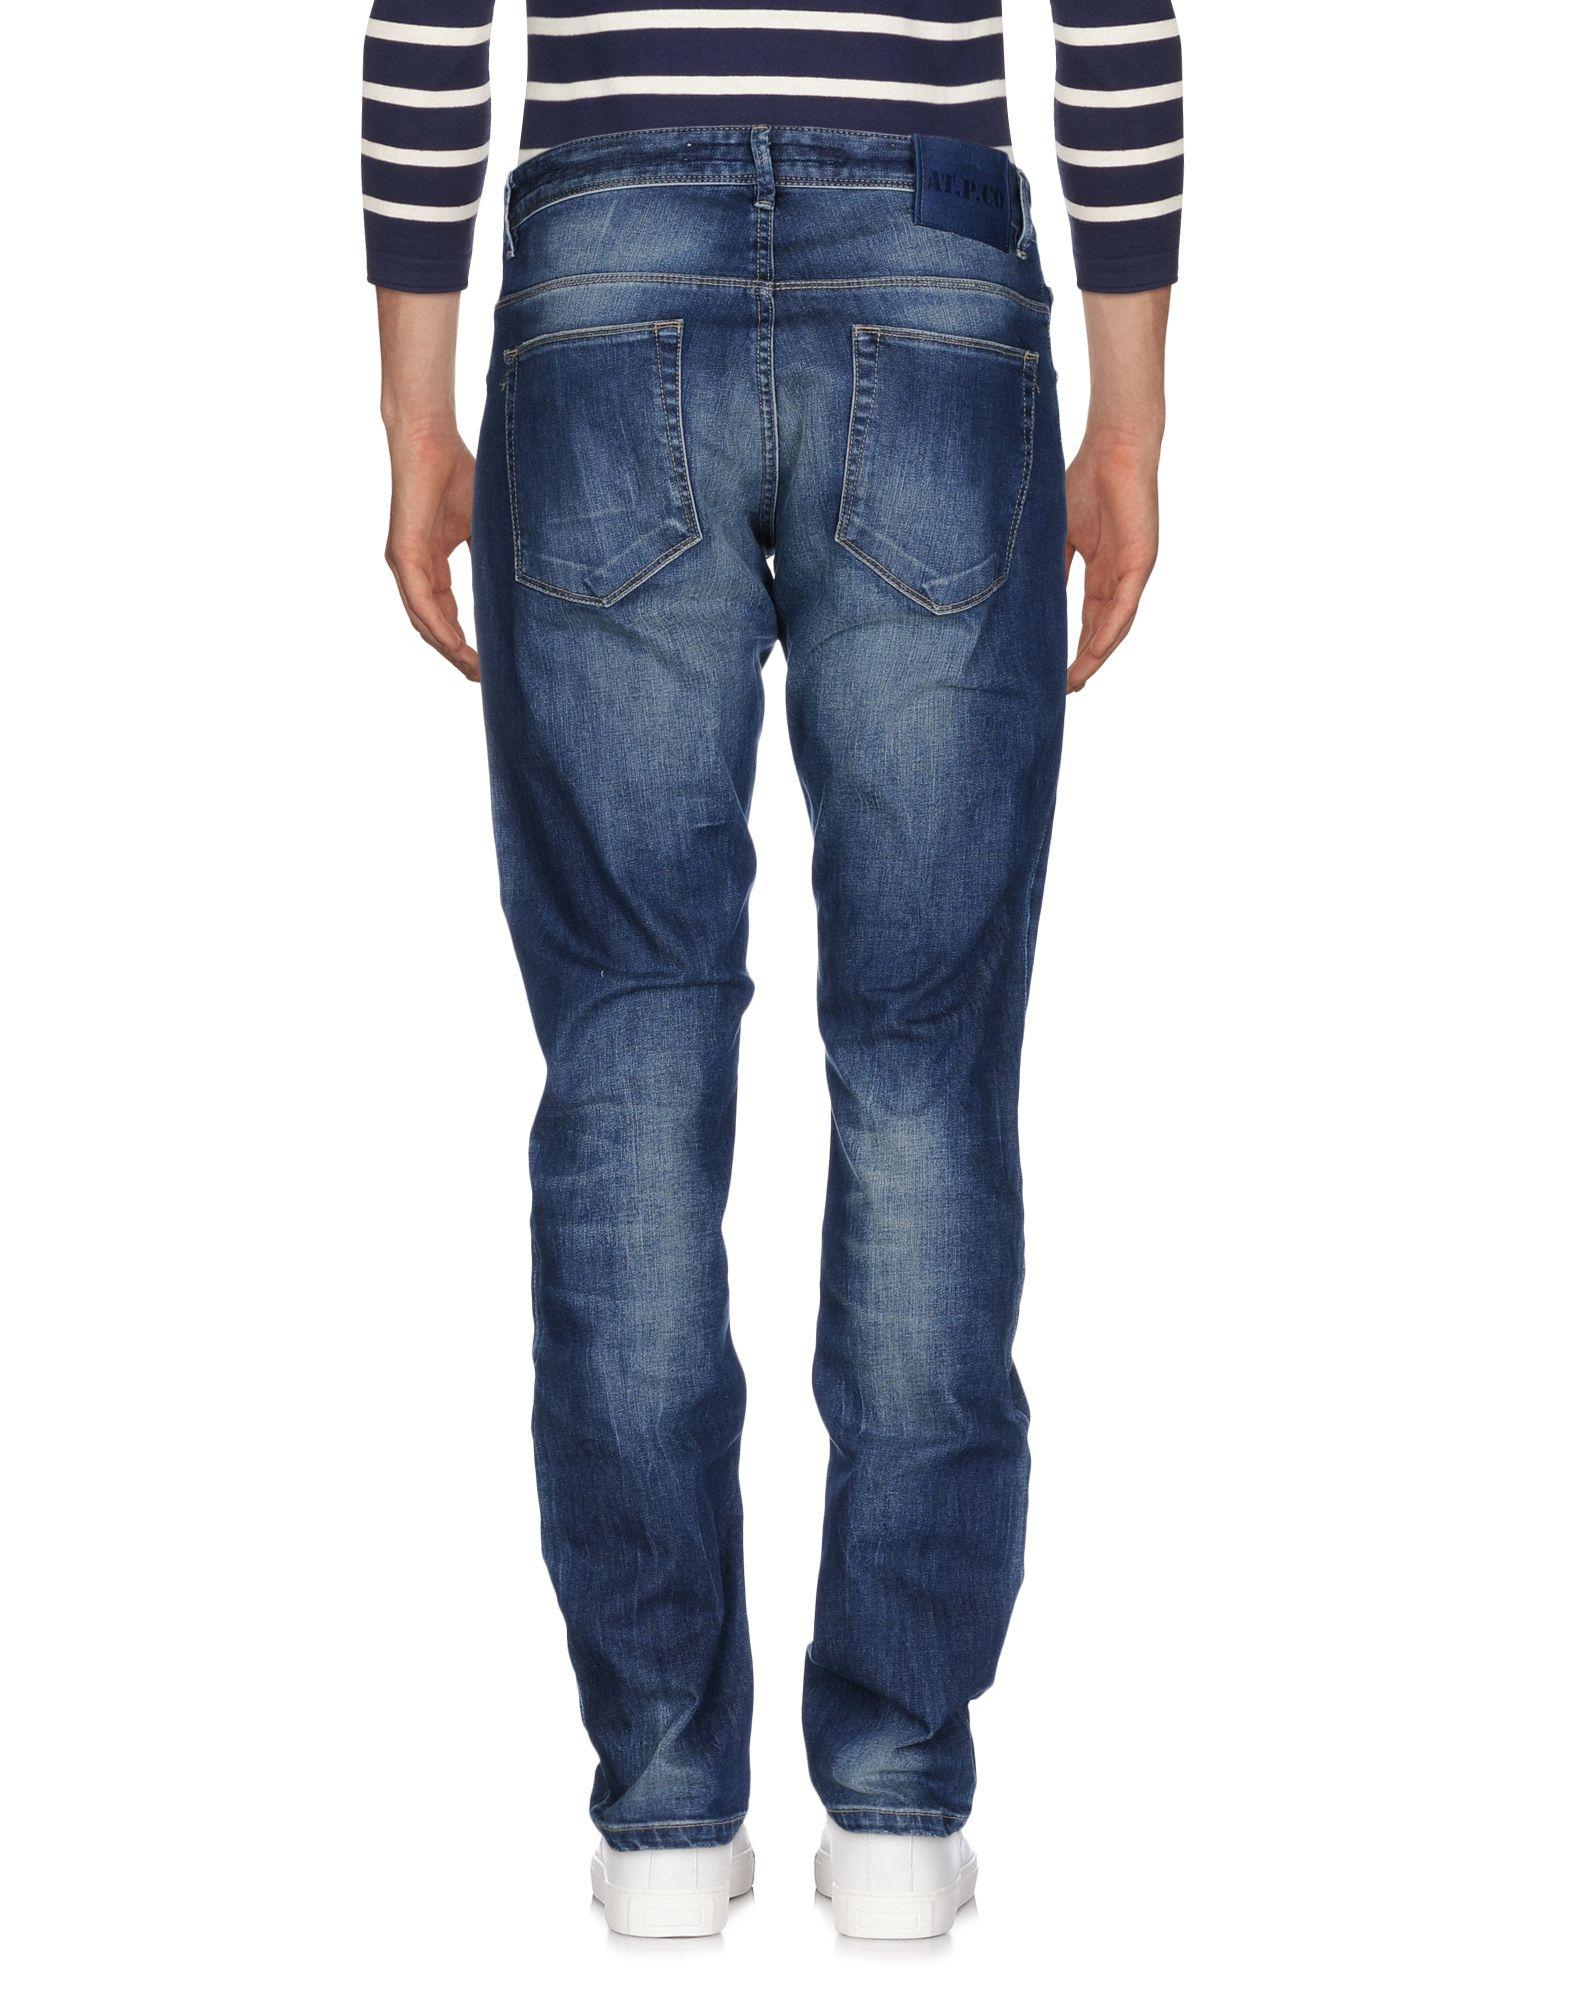 Pantaloni Jeans Uomo At.P.Co Uomo Jeans - 42626221TB 8b112b